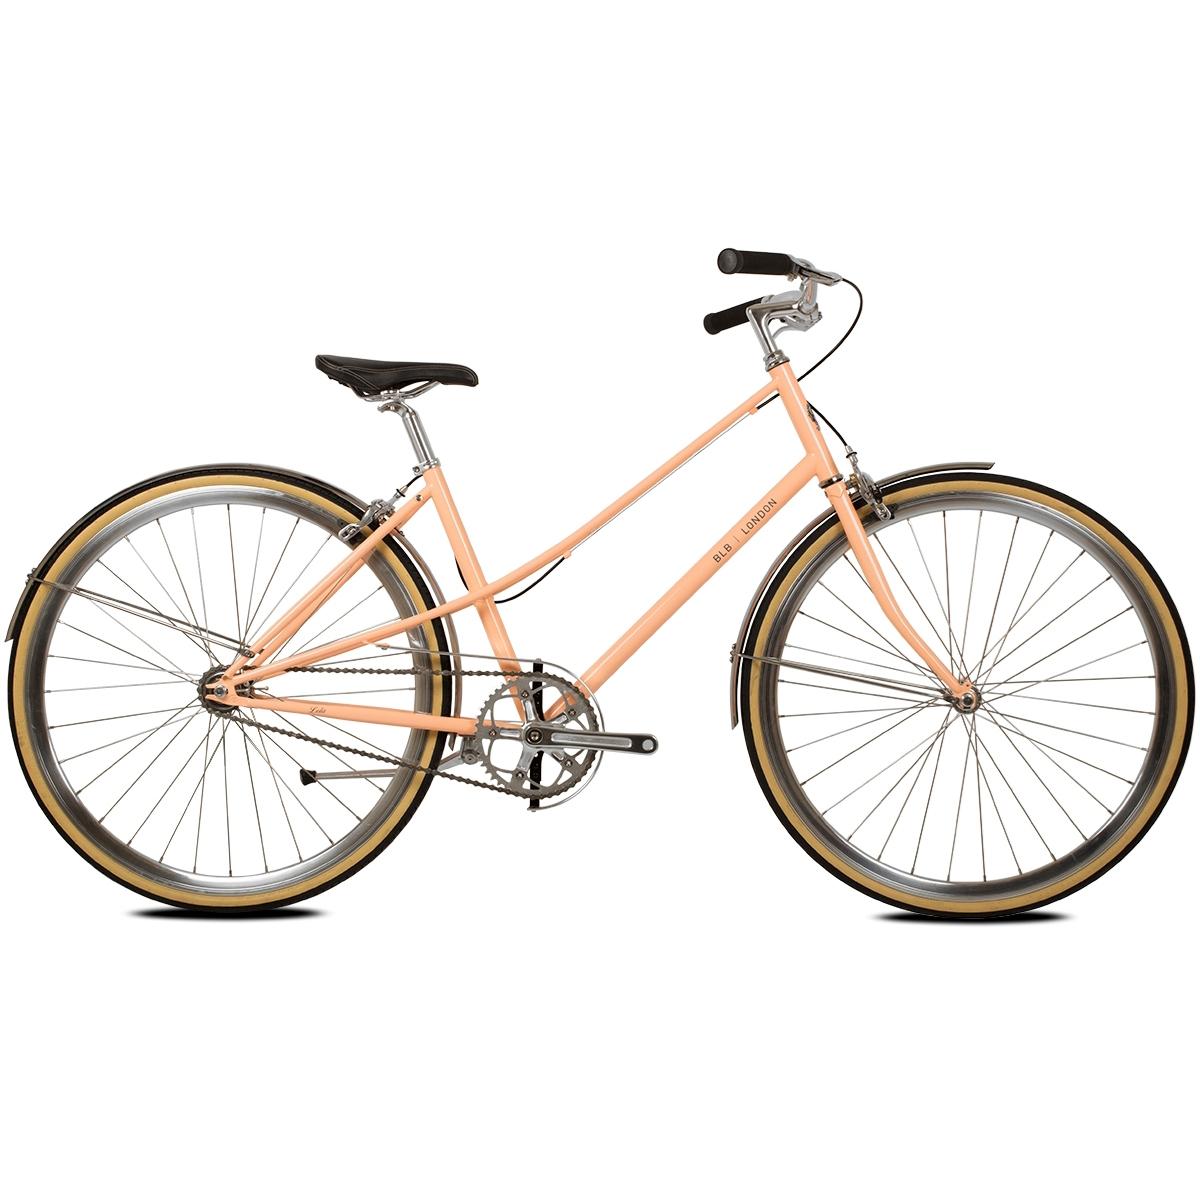 singlespeed fixie bike shop fahrrad jetzt online kaufen bmo. Black Bedroom Furniture Sets. Home Design Ideas